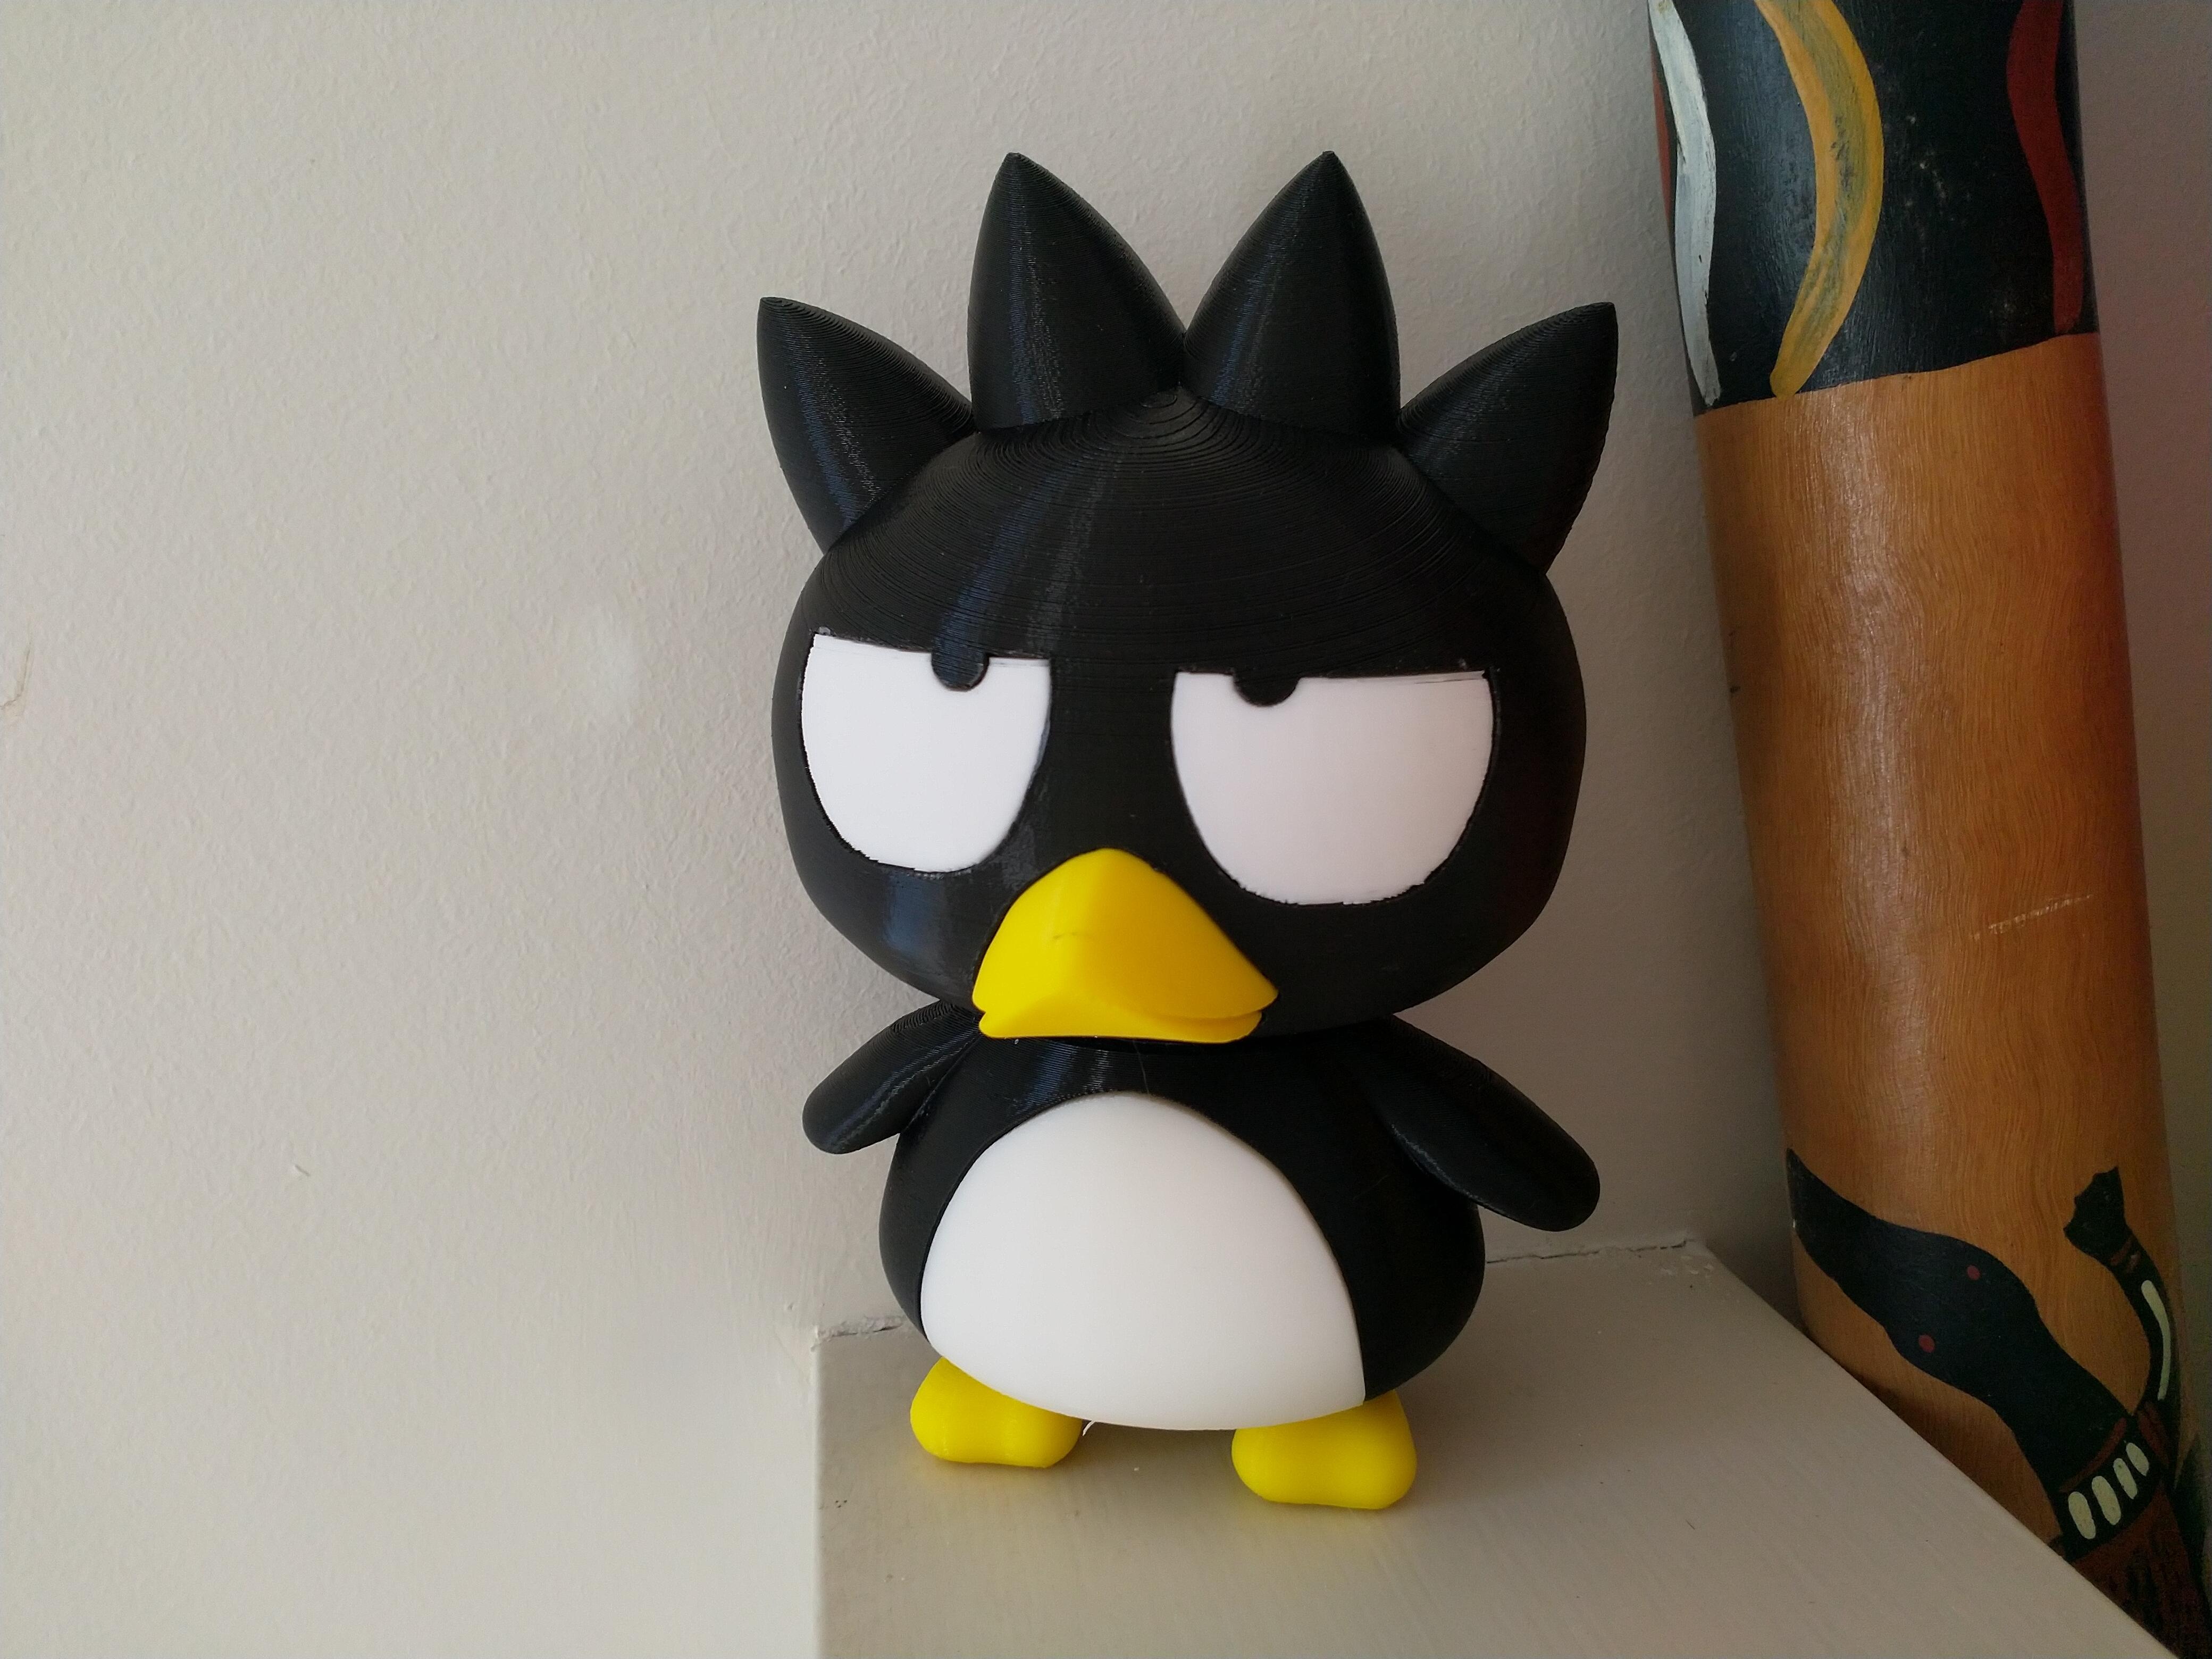 IMG_20200211_085747.jpg Download free STL file Badtz-Maru (バッドばつ丸, Baddo Batsu Maru) • 3D printable design, Jangie